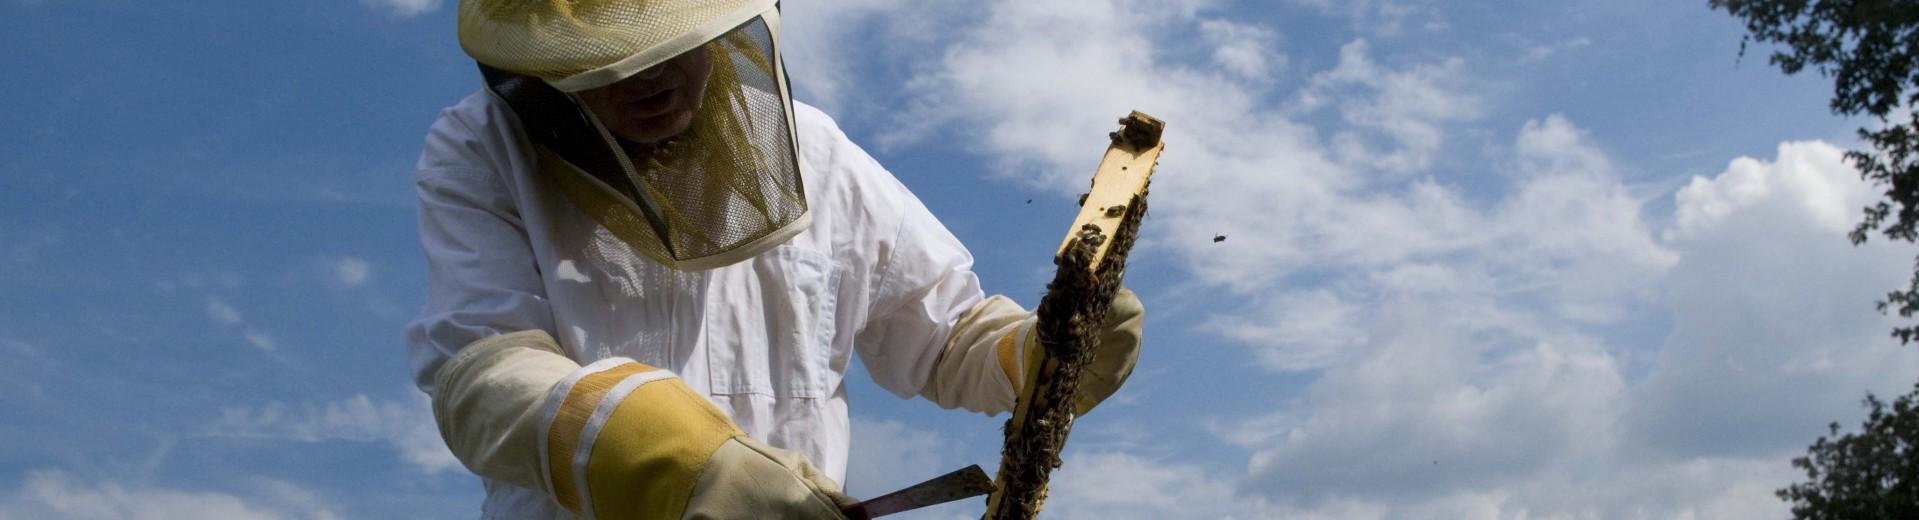 The Generous Beekeeper